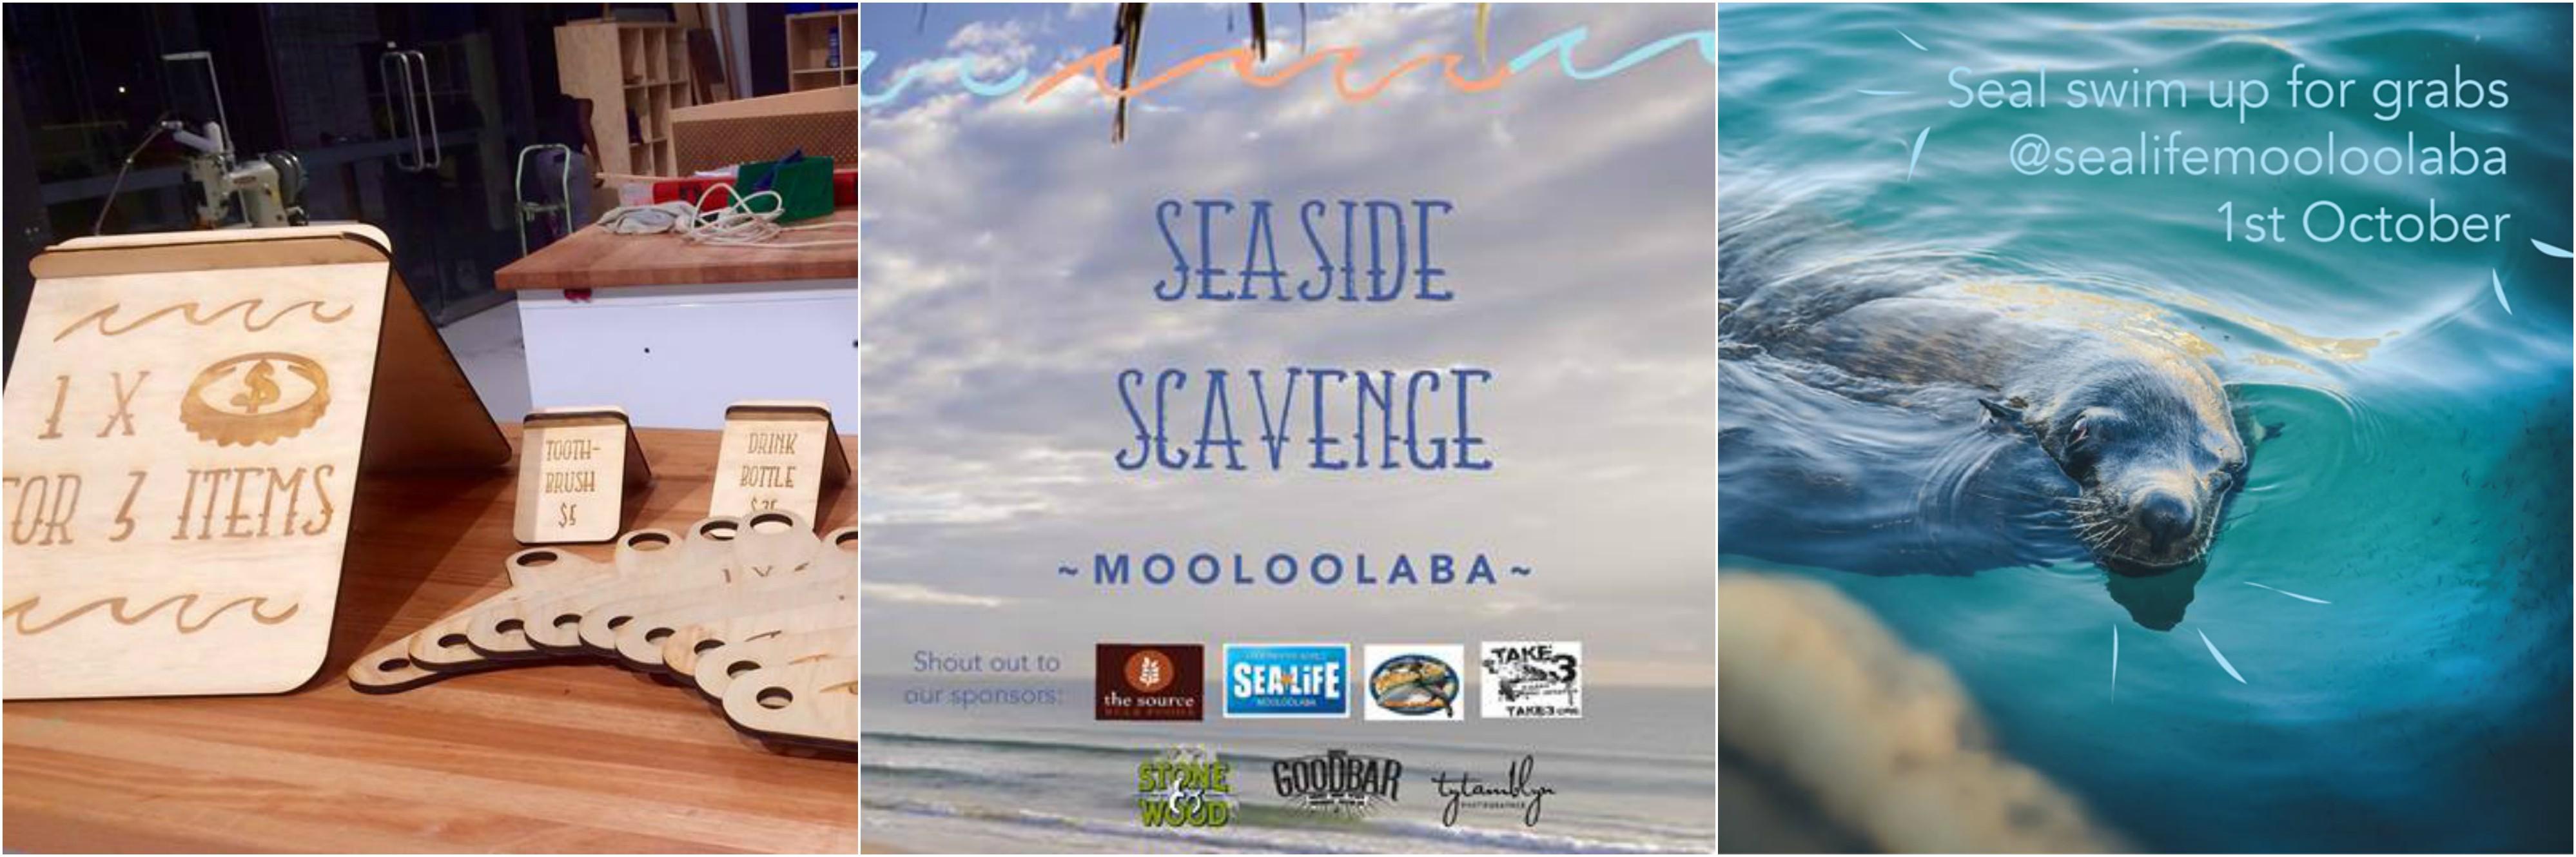 Seaside Scavenge